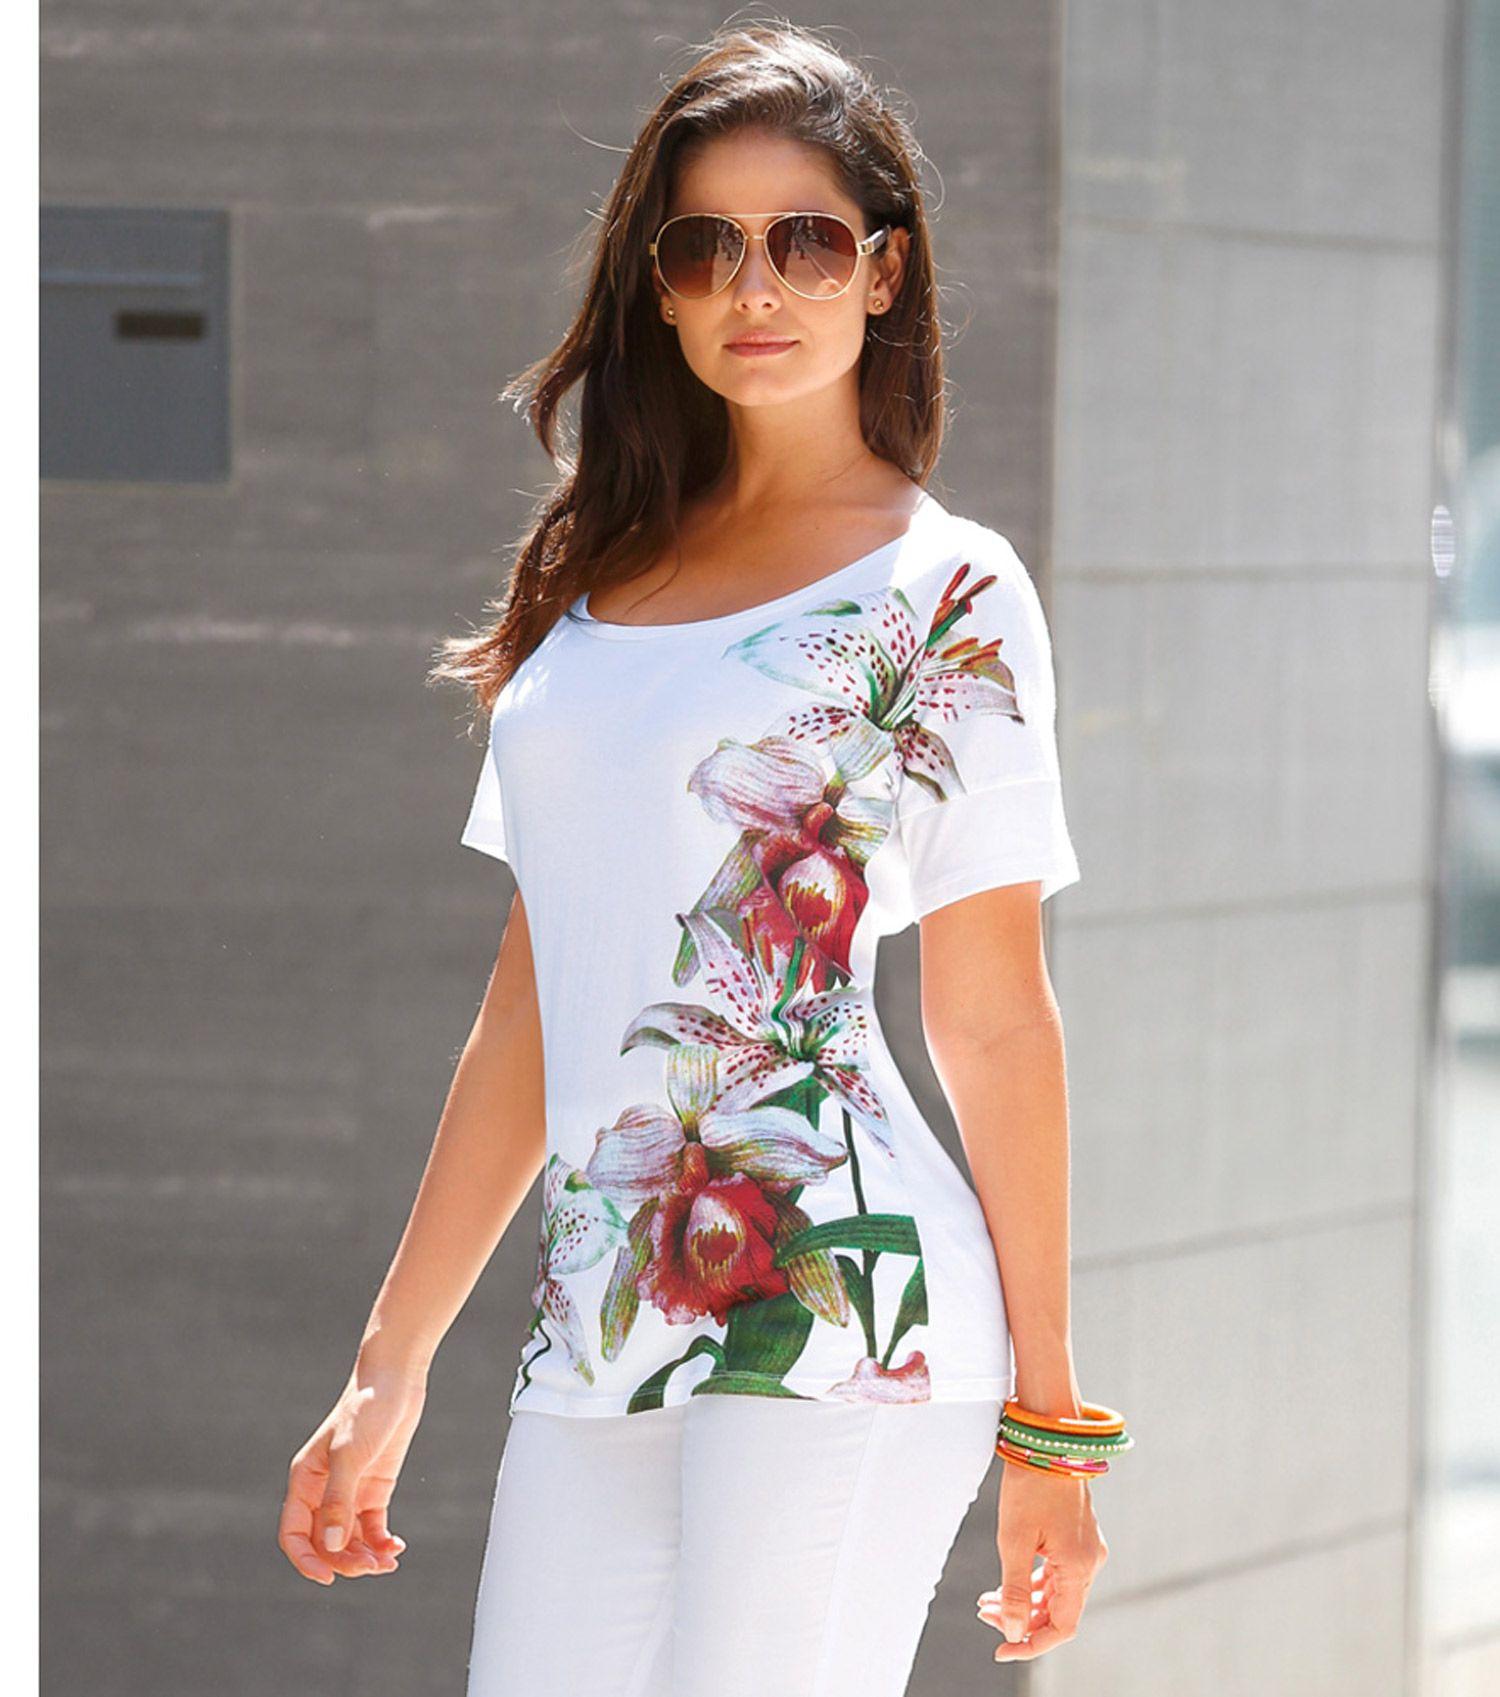 b2b89f3f6399b Camiseta mujer manga corta con estampado floral Moda Mujer 10 Venca ...